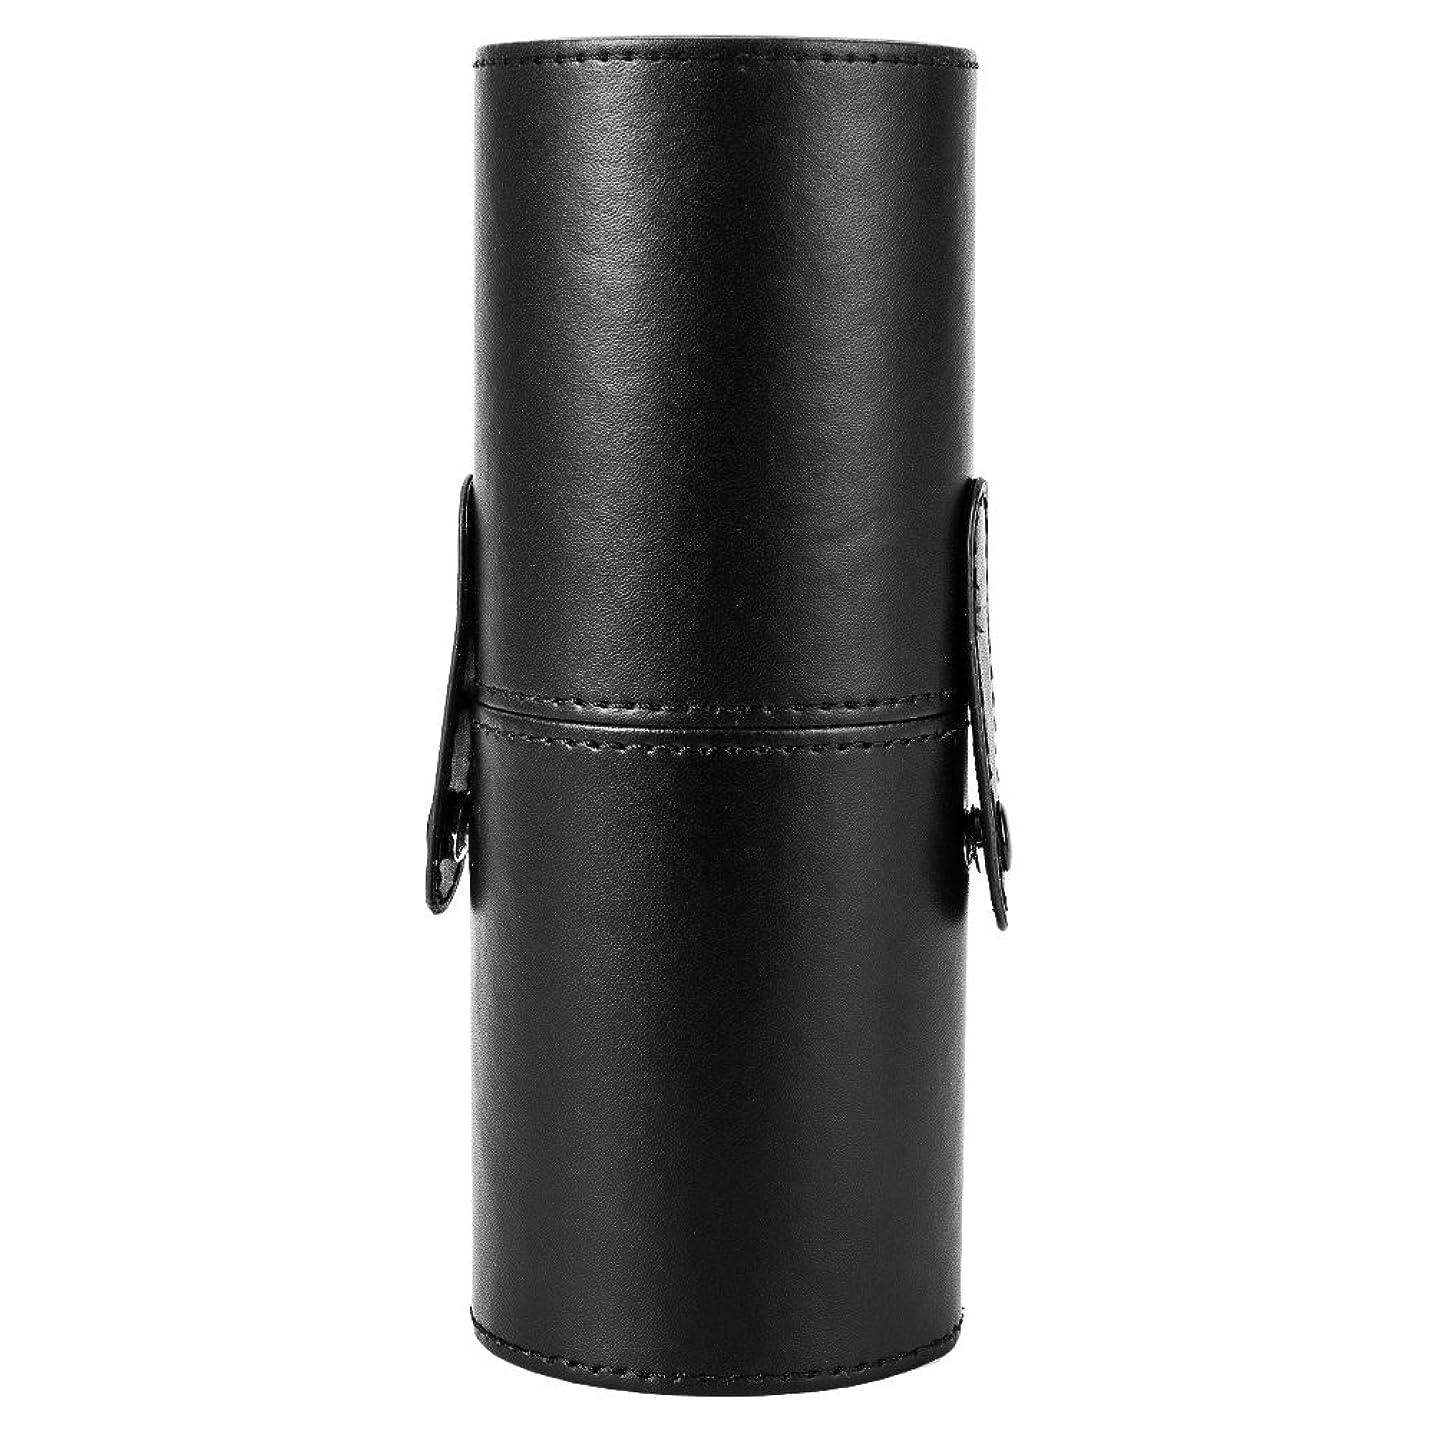 SeagullWaves メイクブラシケース 化粧カップ 収納 携帯 筒型 かわいい メイク アップ ブラシ 専用 収納 ケース 文房具バレル レディース 収納桶 収納筒 全4色 (ブラック)